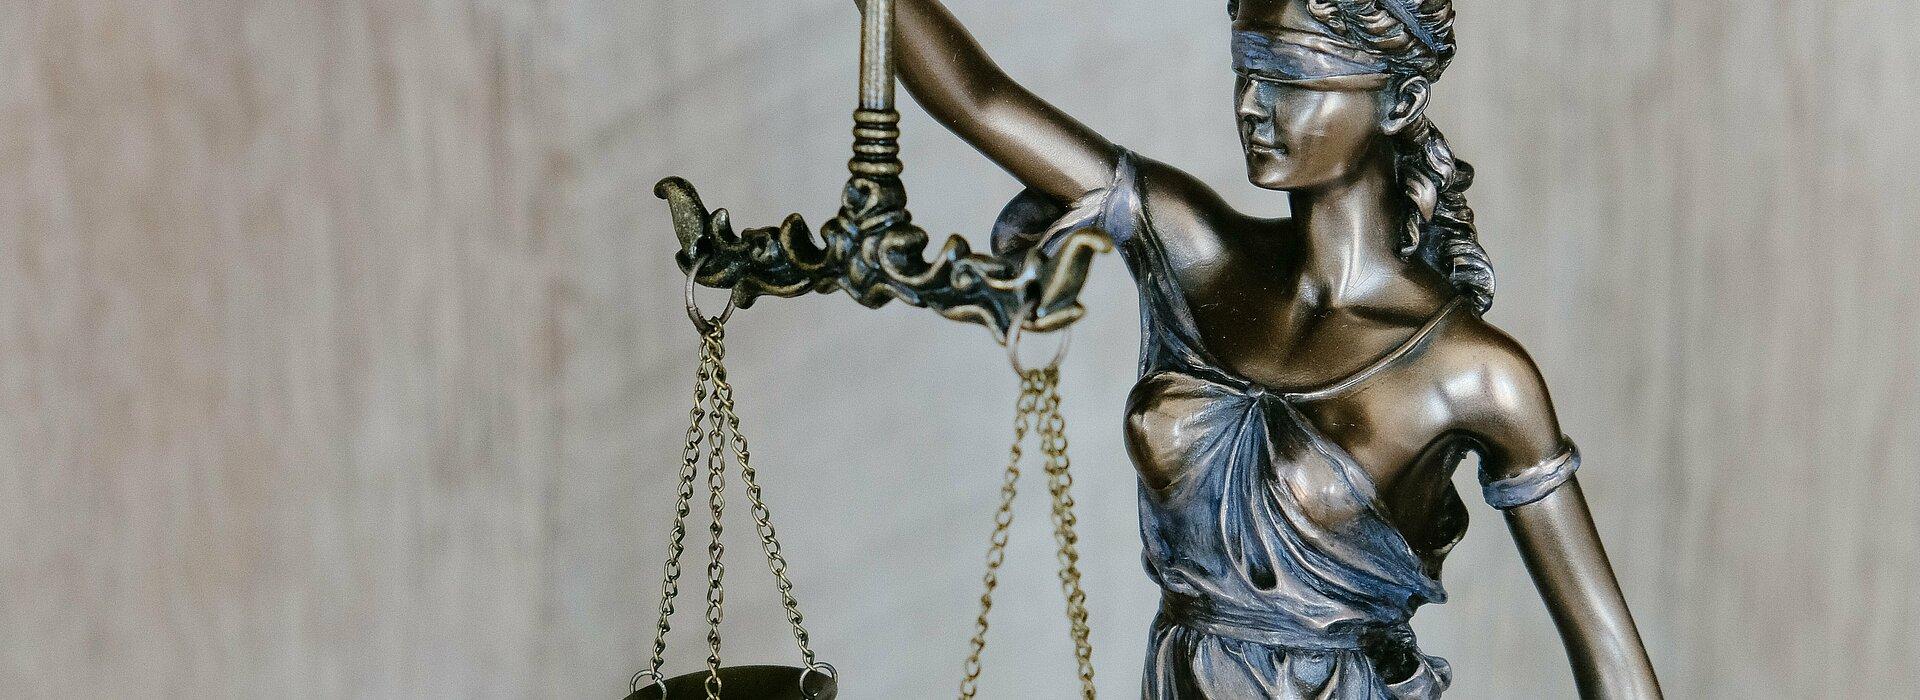 Símbolo da justiça